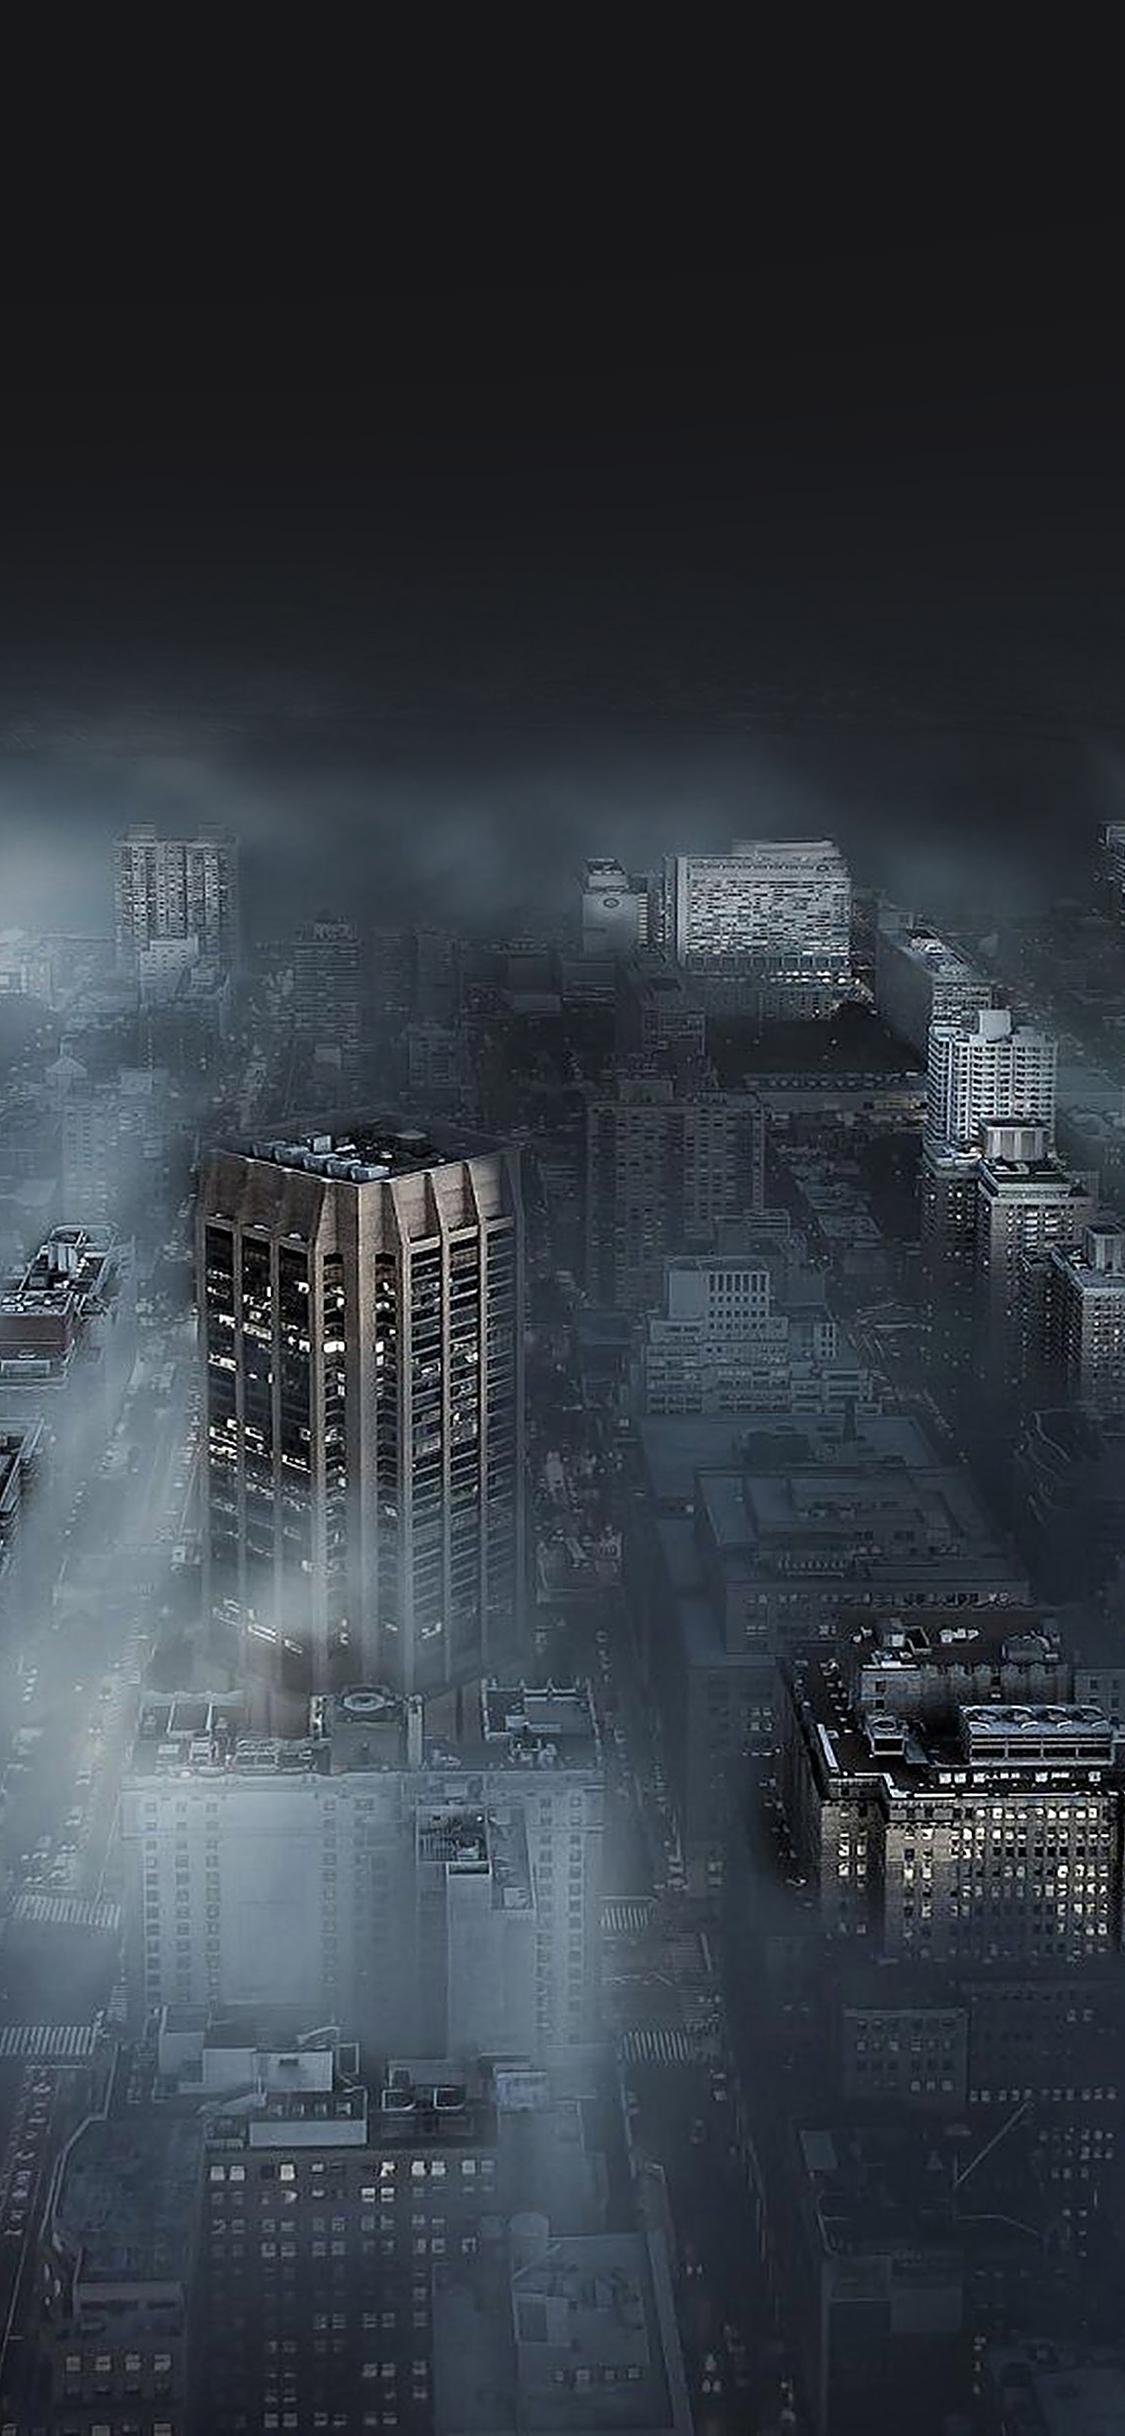 iPhoneXpapers.com-Apple-iPhone-wallpaper-ma80-dark-city-in-fog-nature